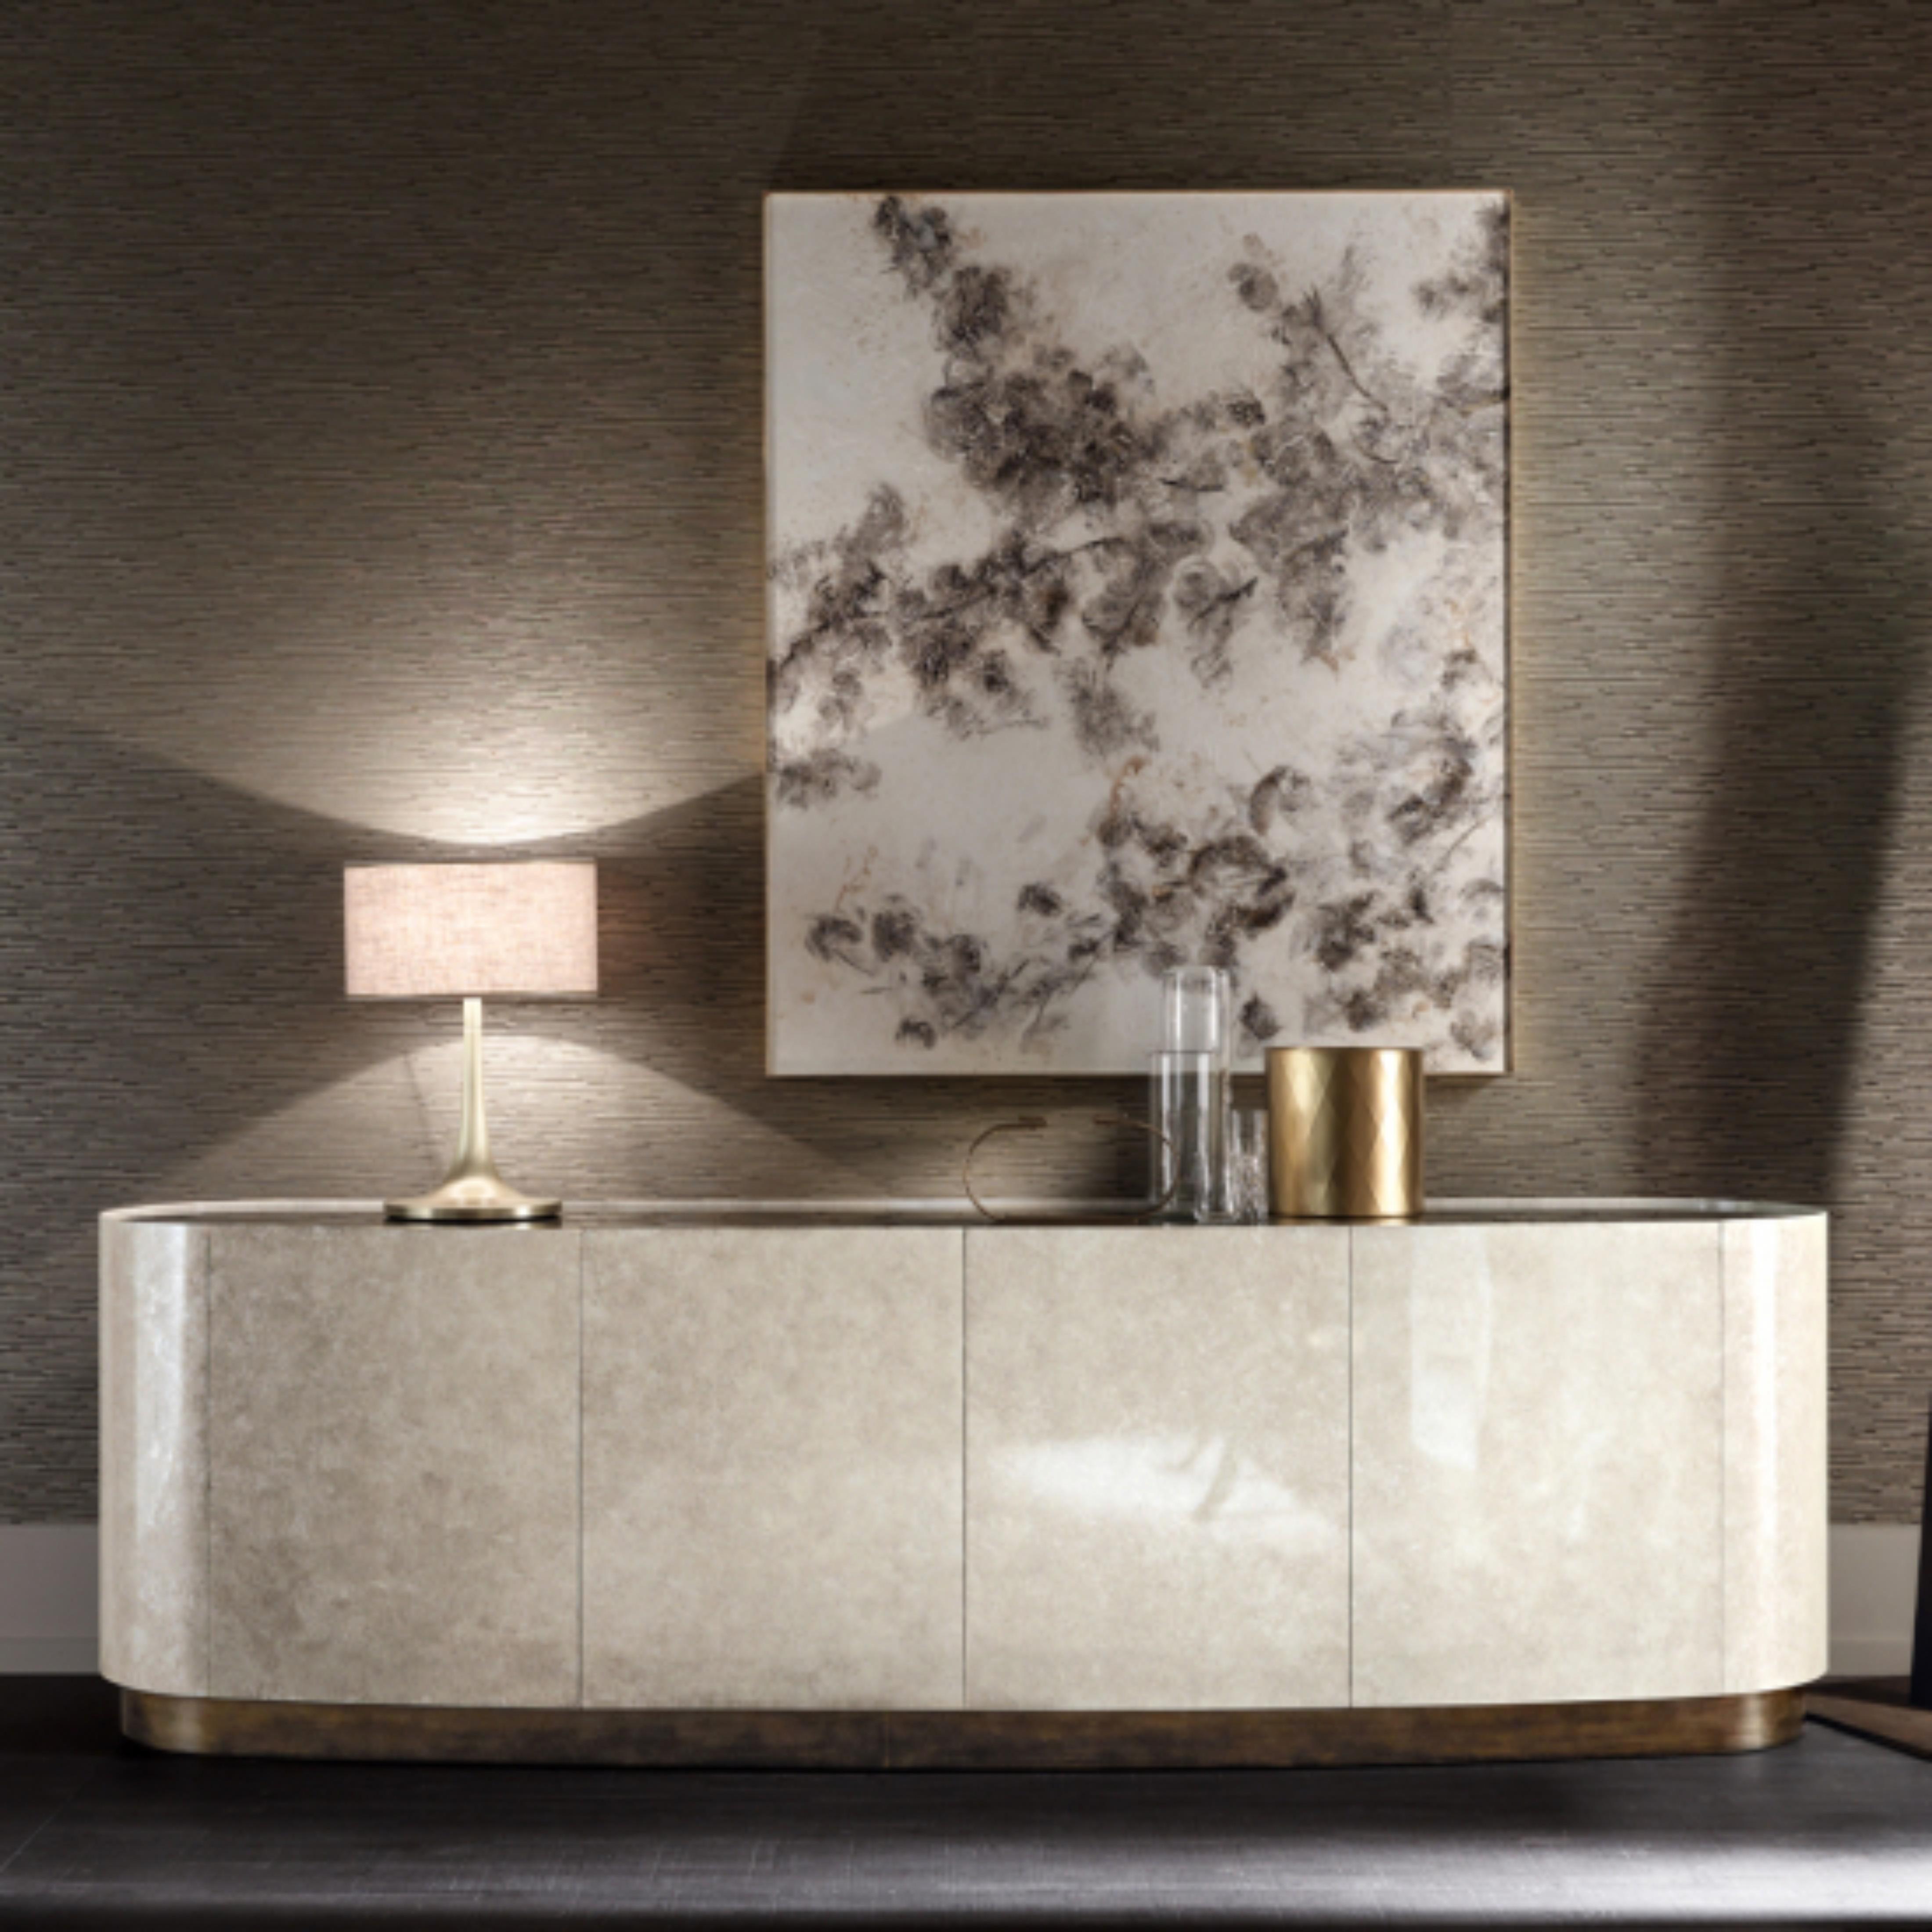 dining room decor ideas 5 Astonishing Dining Room Decor Ideas Luxury Italian Designer Seashell Buffet 1 550x550